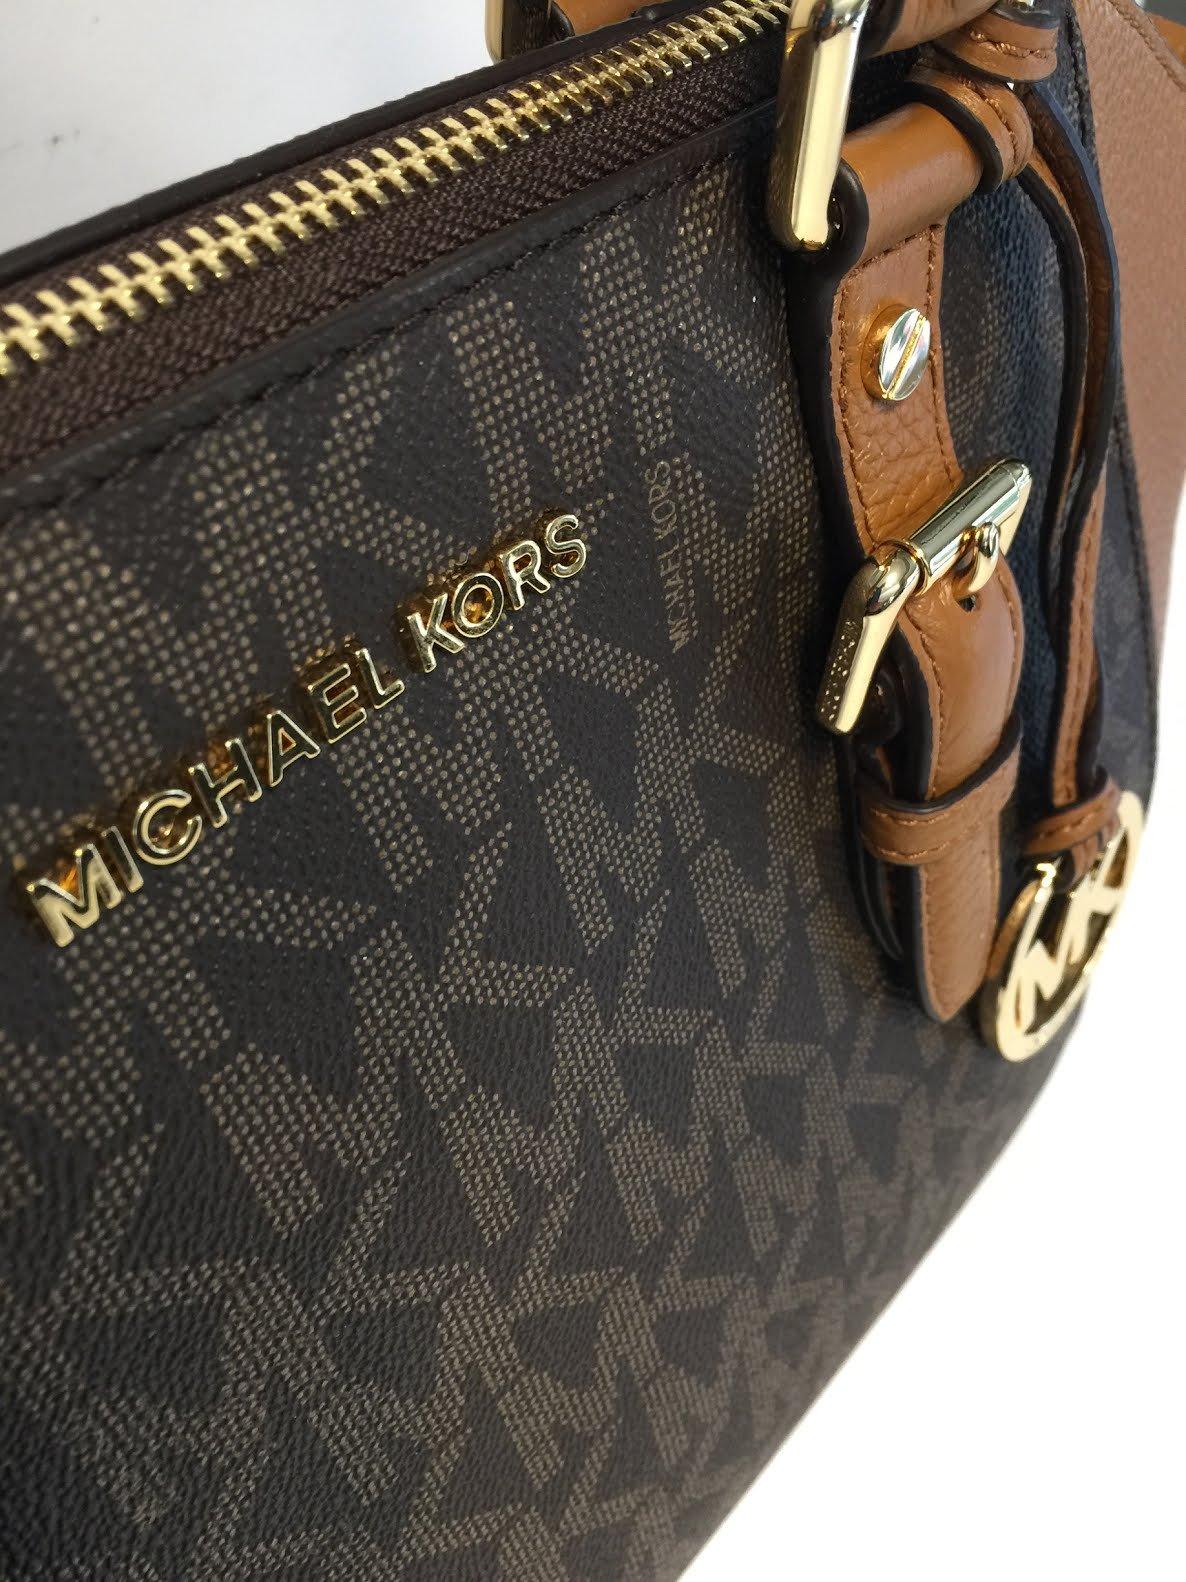 MICHAEL Michael Kors Ciara Large TZ Satchel bundled with Michael Kors Jet Set Travel Continental Wallet Wristlet (Signature MK Brown/Acorn) by Michael Kors (Image #4)